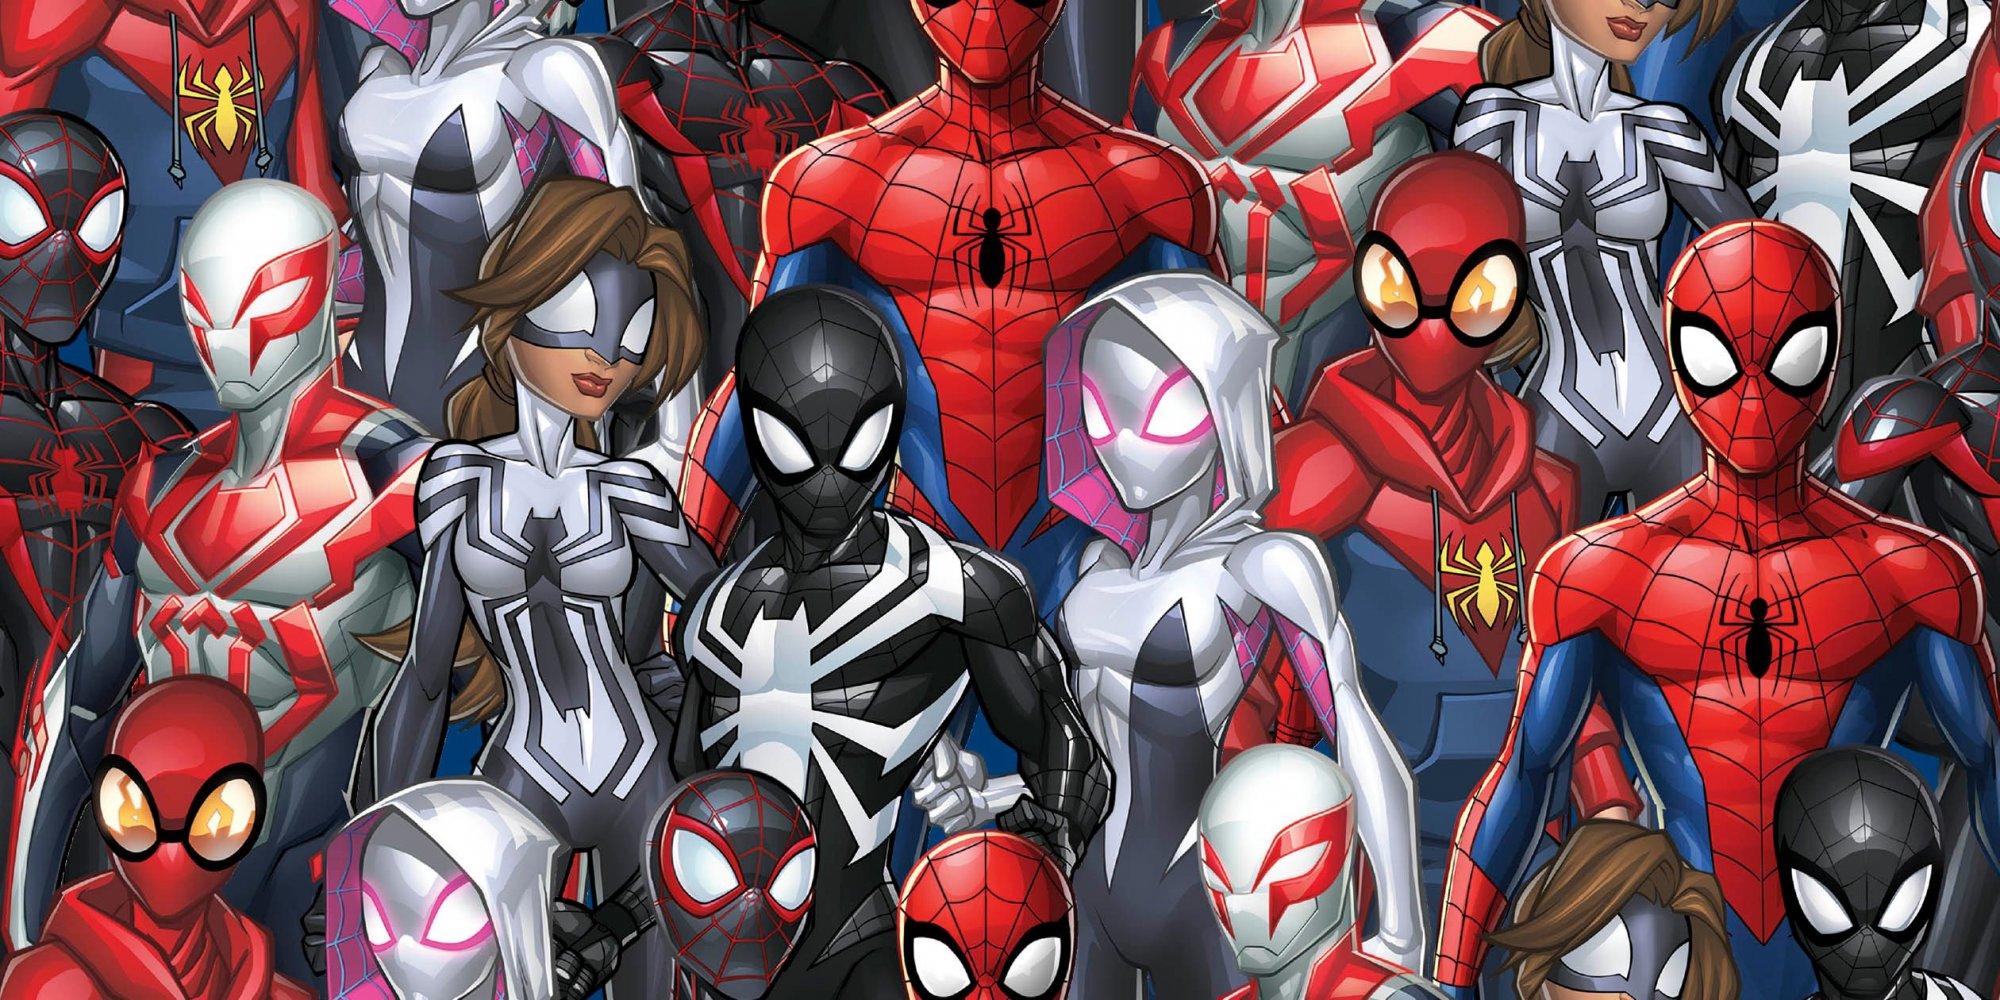 PROMO* SC-Marvel Spiderman Digital 69717-D650715 Marvel Spiderman & Friends